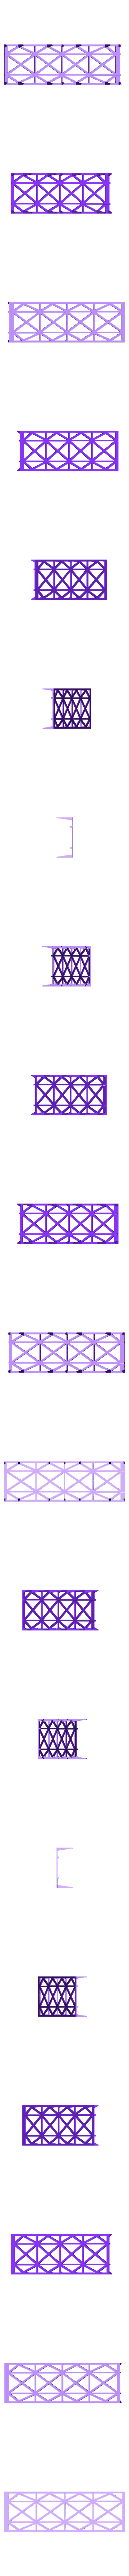 Bridge Bottom.stl Download free STL file HO Scale Warren Truss Bridge 7.5 Inches • Model to 3D print, kabrumble